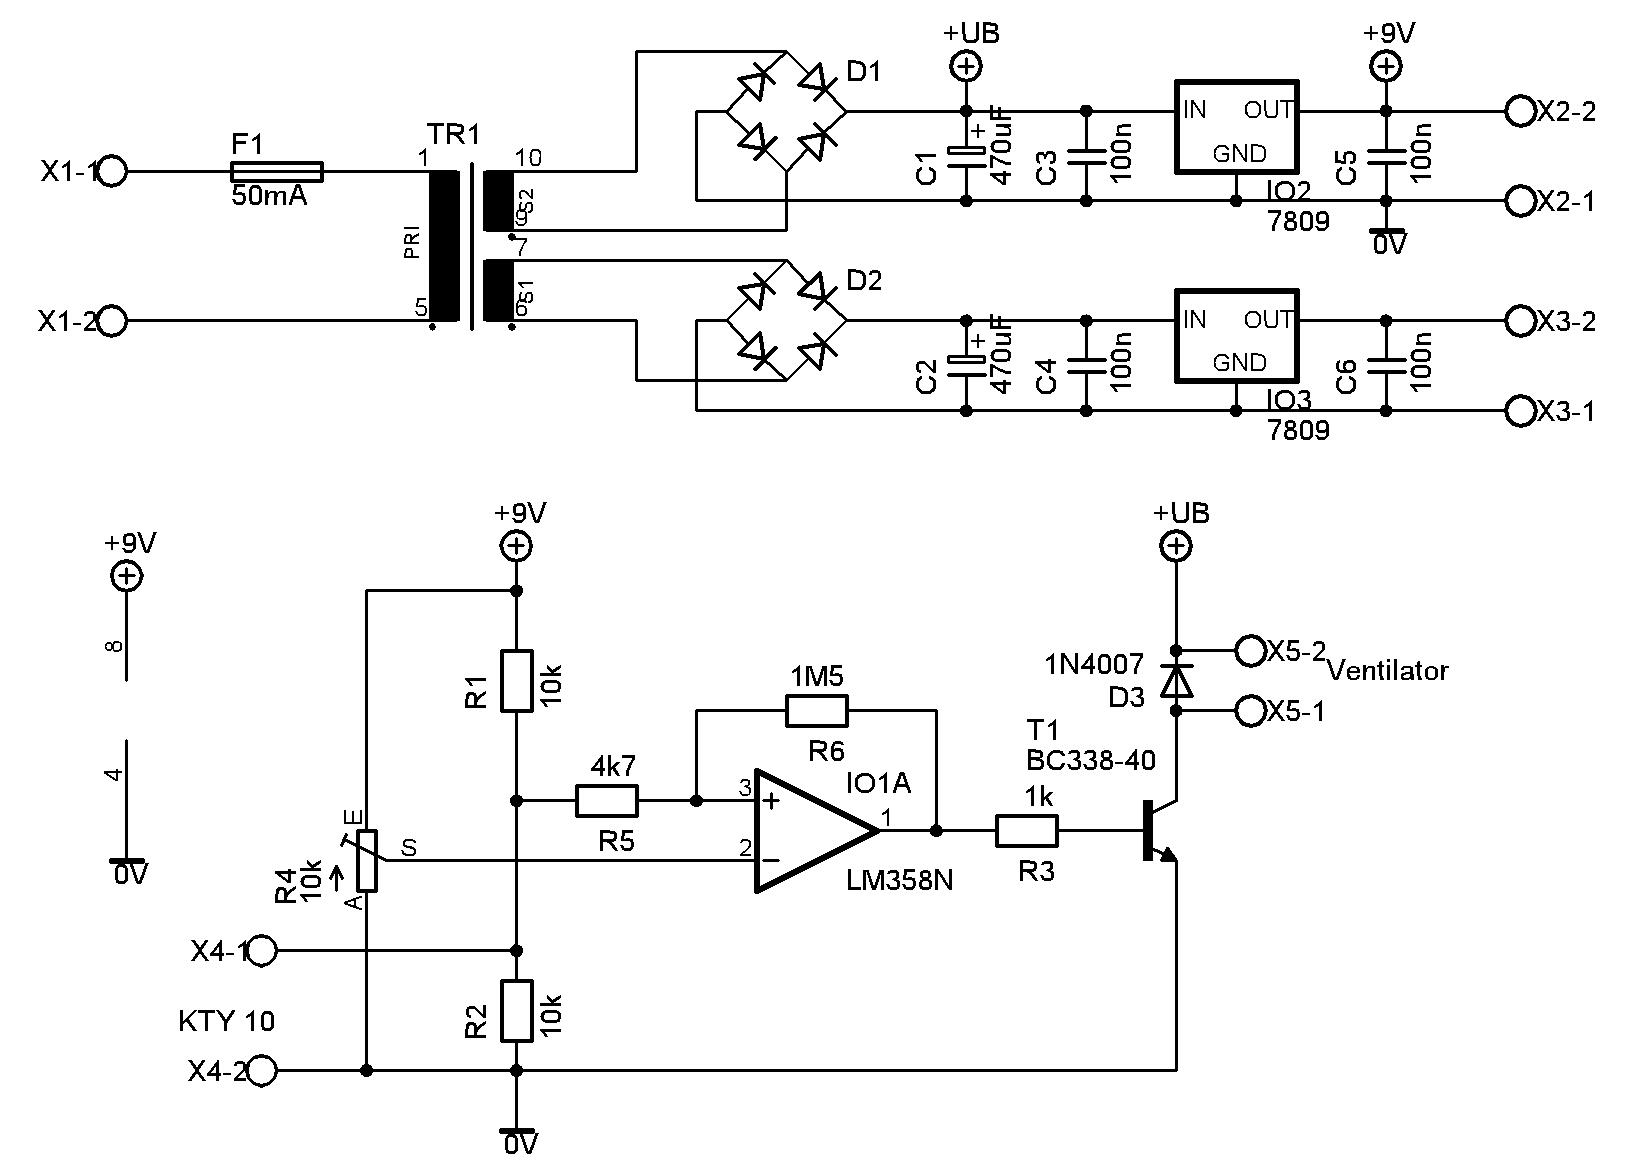 Frum Elektronika Na Webu Martina Olejra Schematic Diagrams Http Atmega32 Avr Com Apc Ups